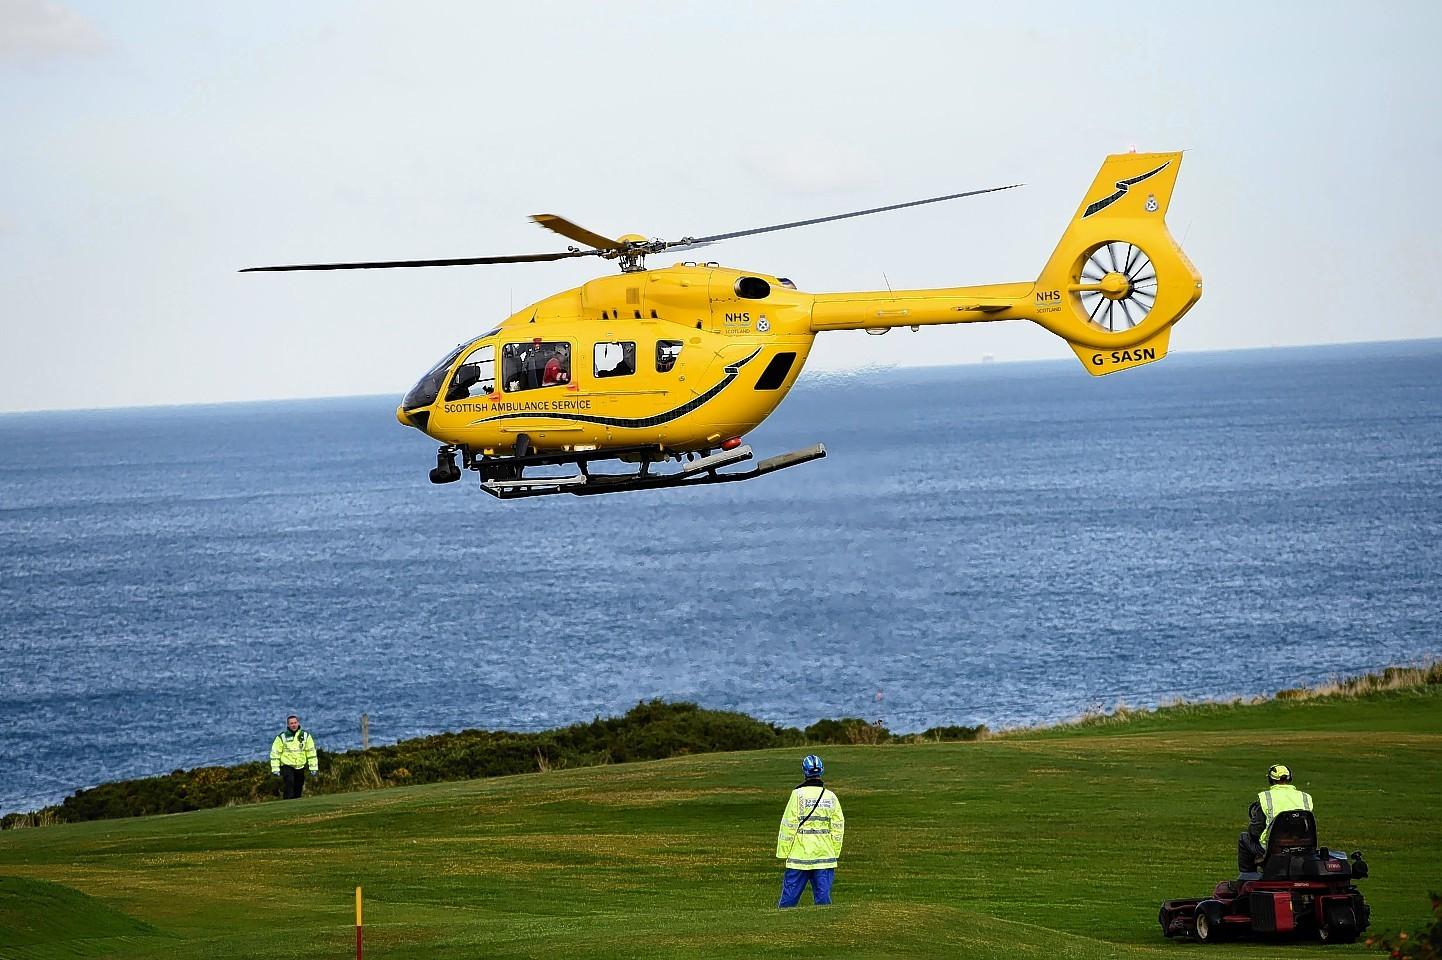 Air ambulance has been called